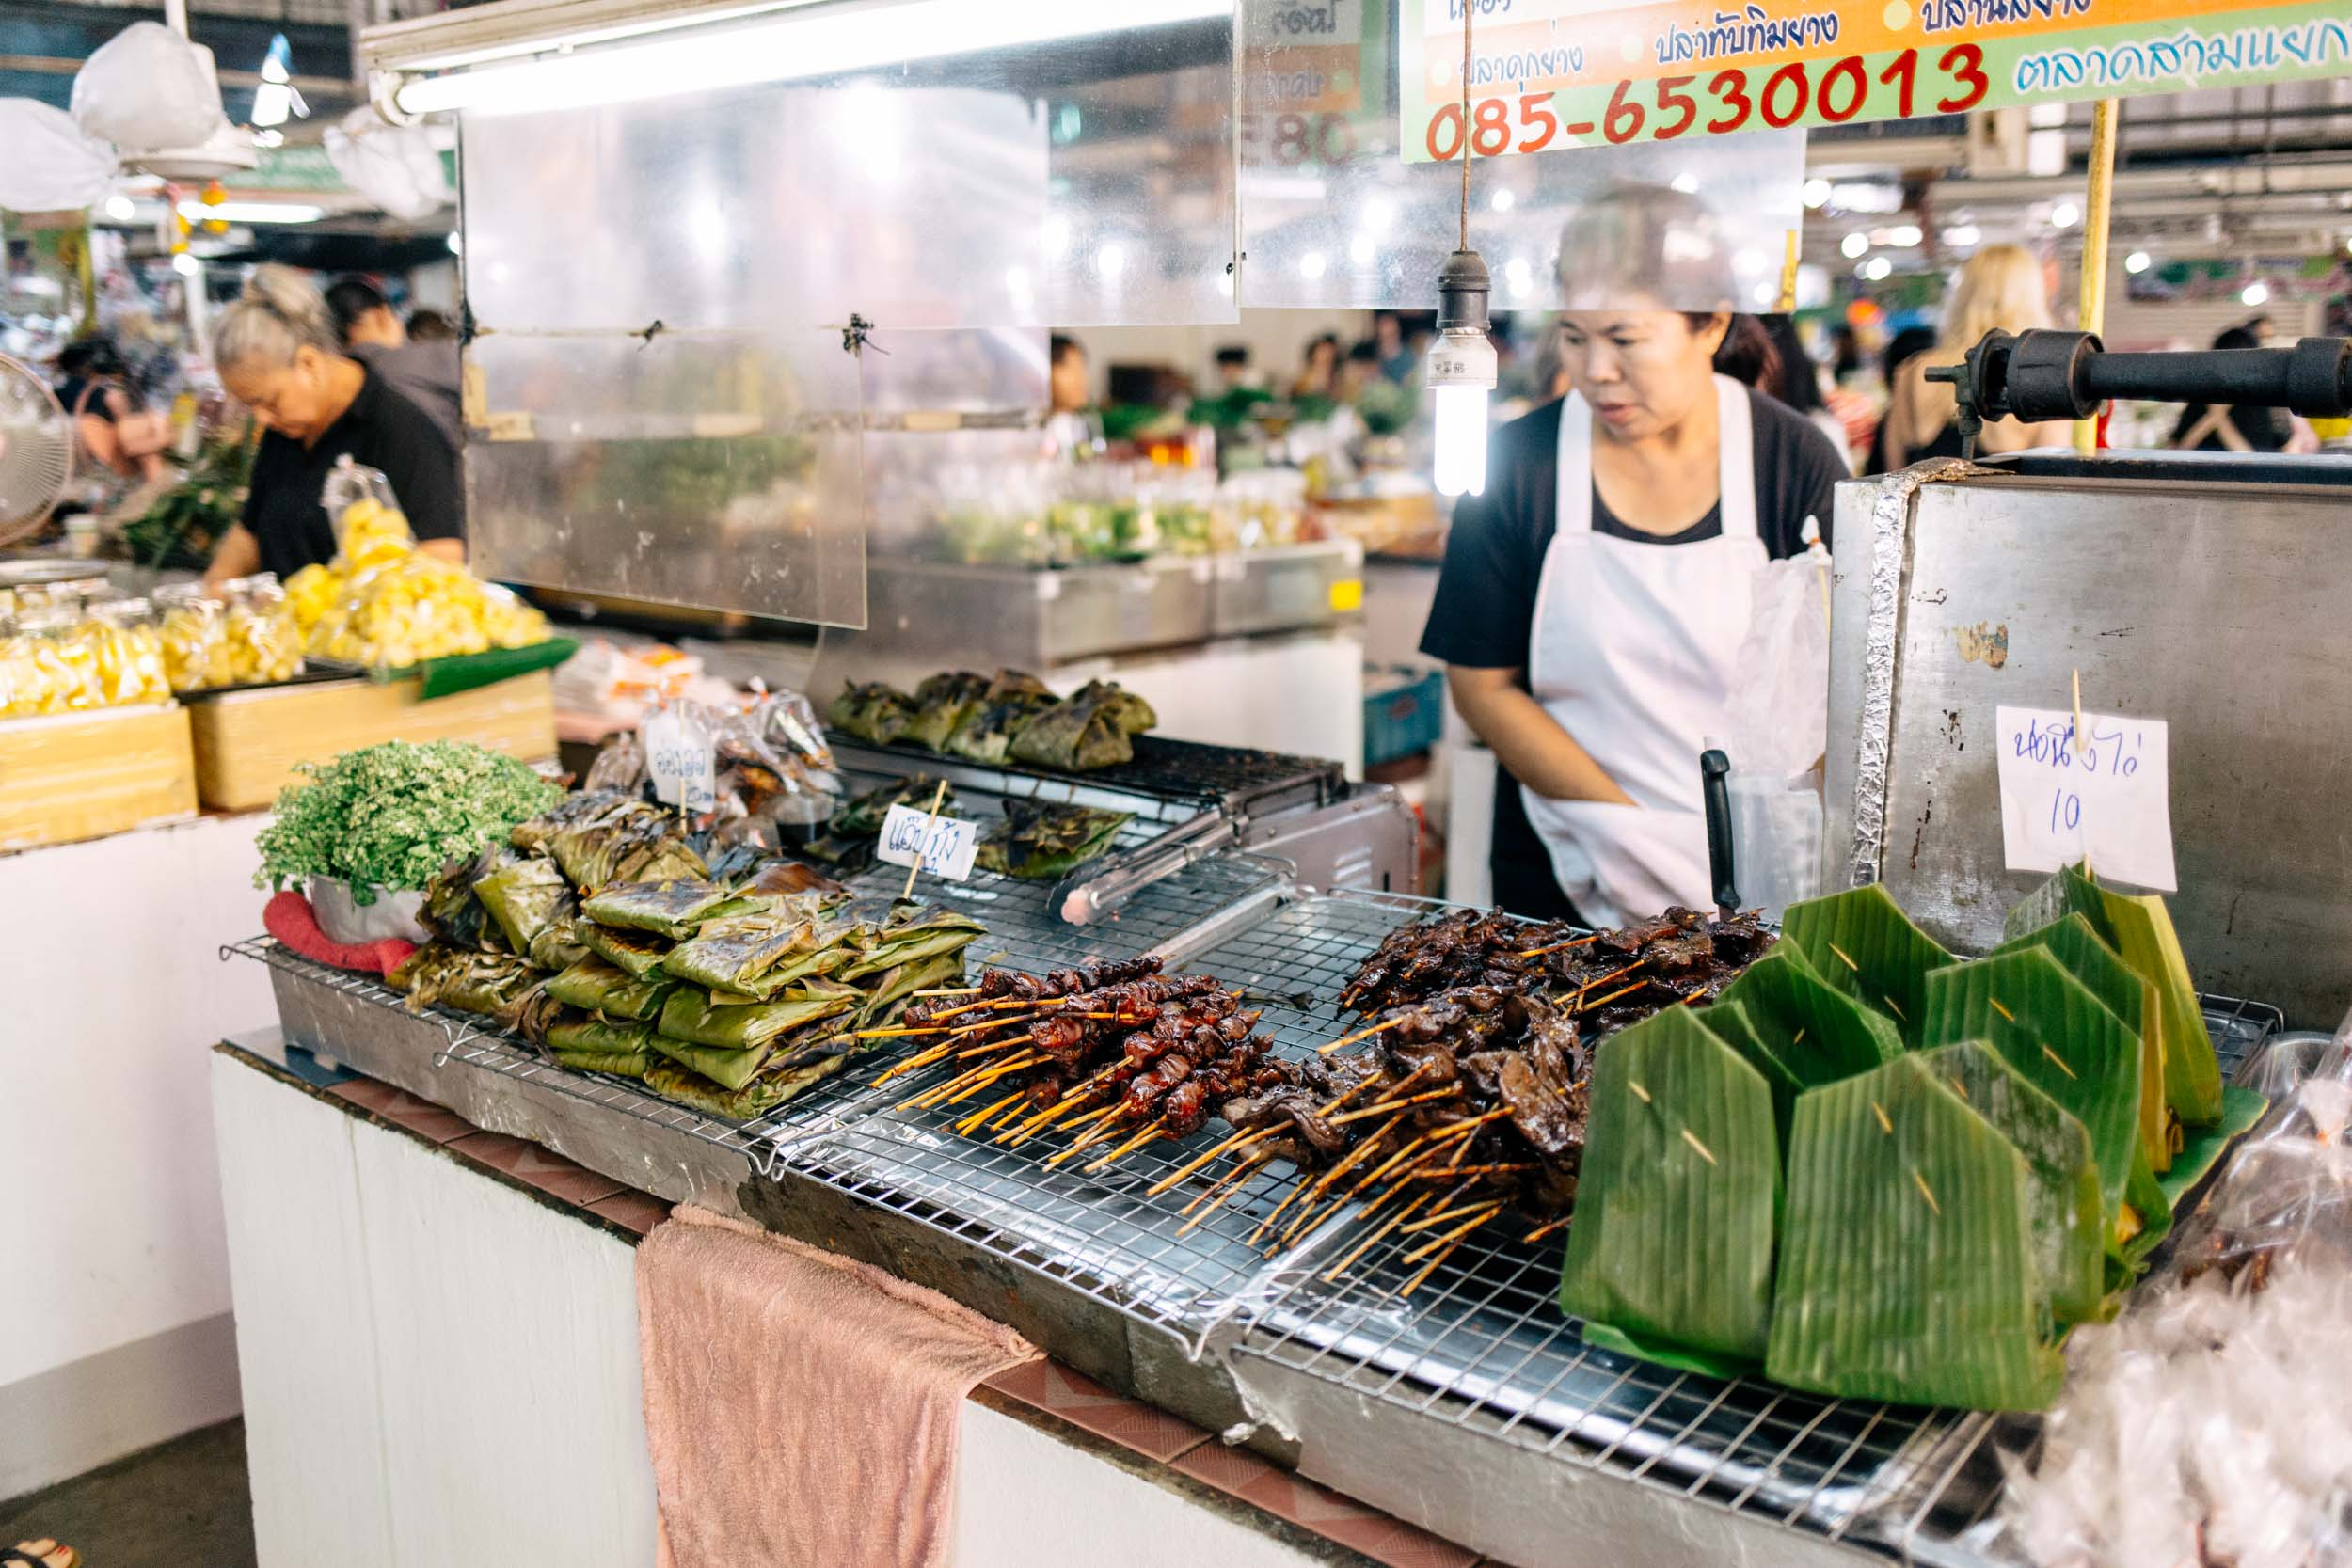 thailand_budget_travel_030.jpg